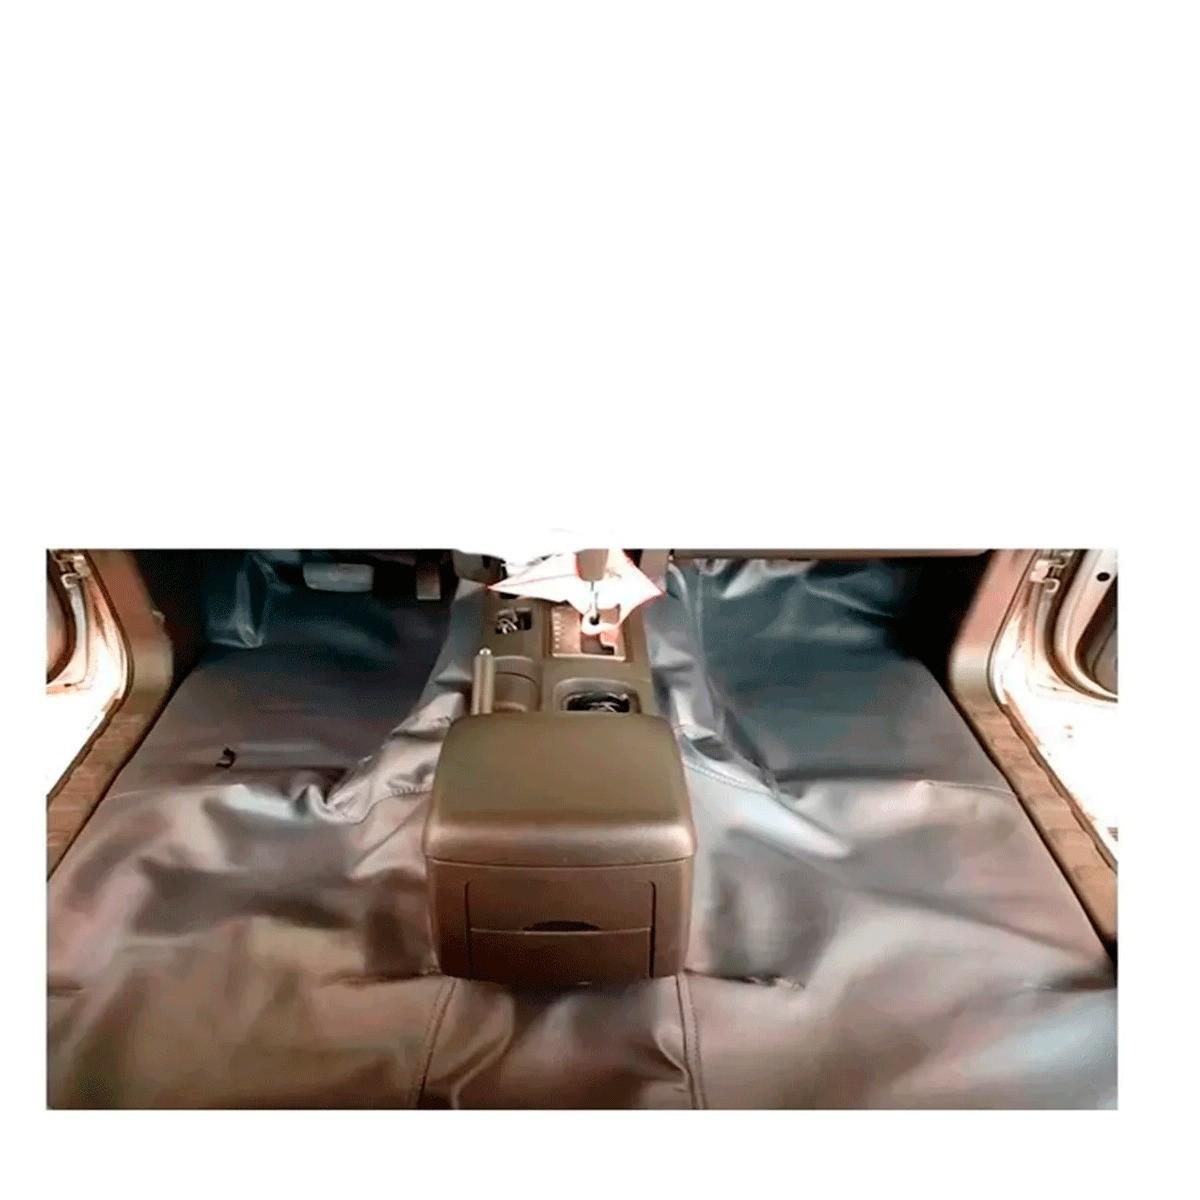 Tapete Automotivo Assoalho Emborrachado Bidim Fiat Uno 2014 a 2020